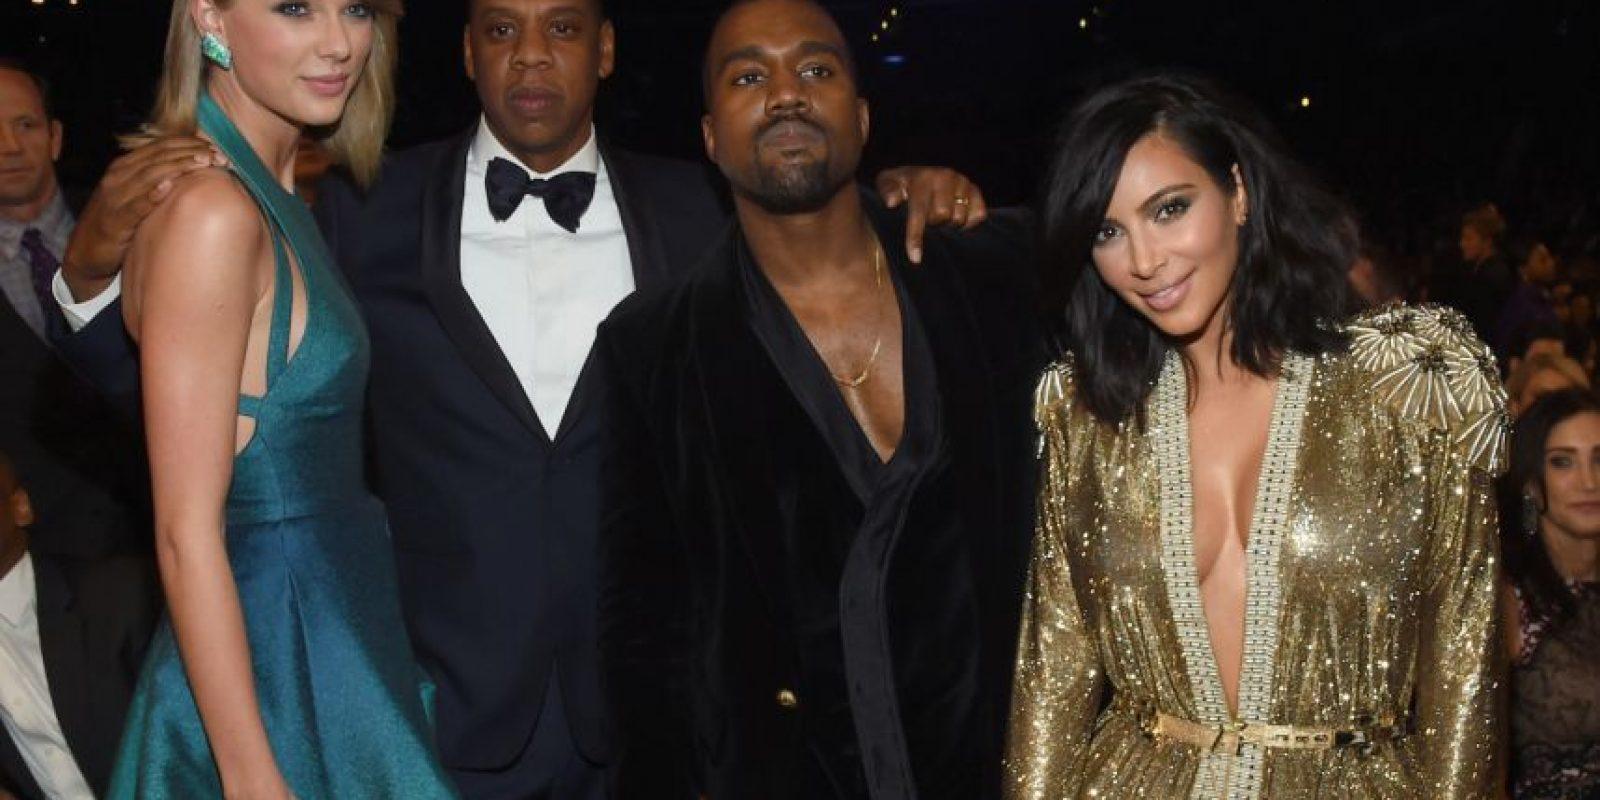 Taylor con Jay Z, Kanye West y Kim Kardashian Foto:Getty Images